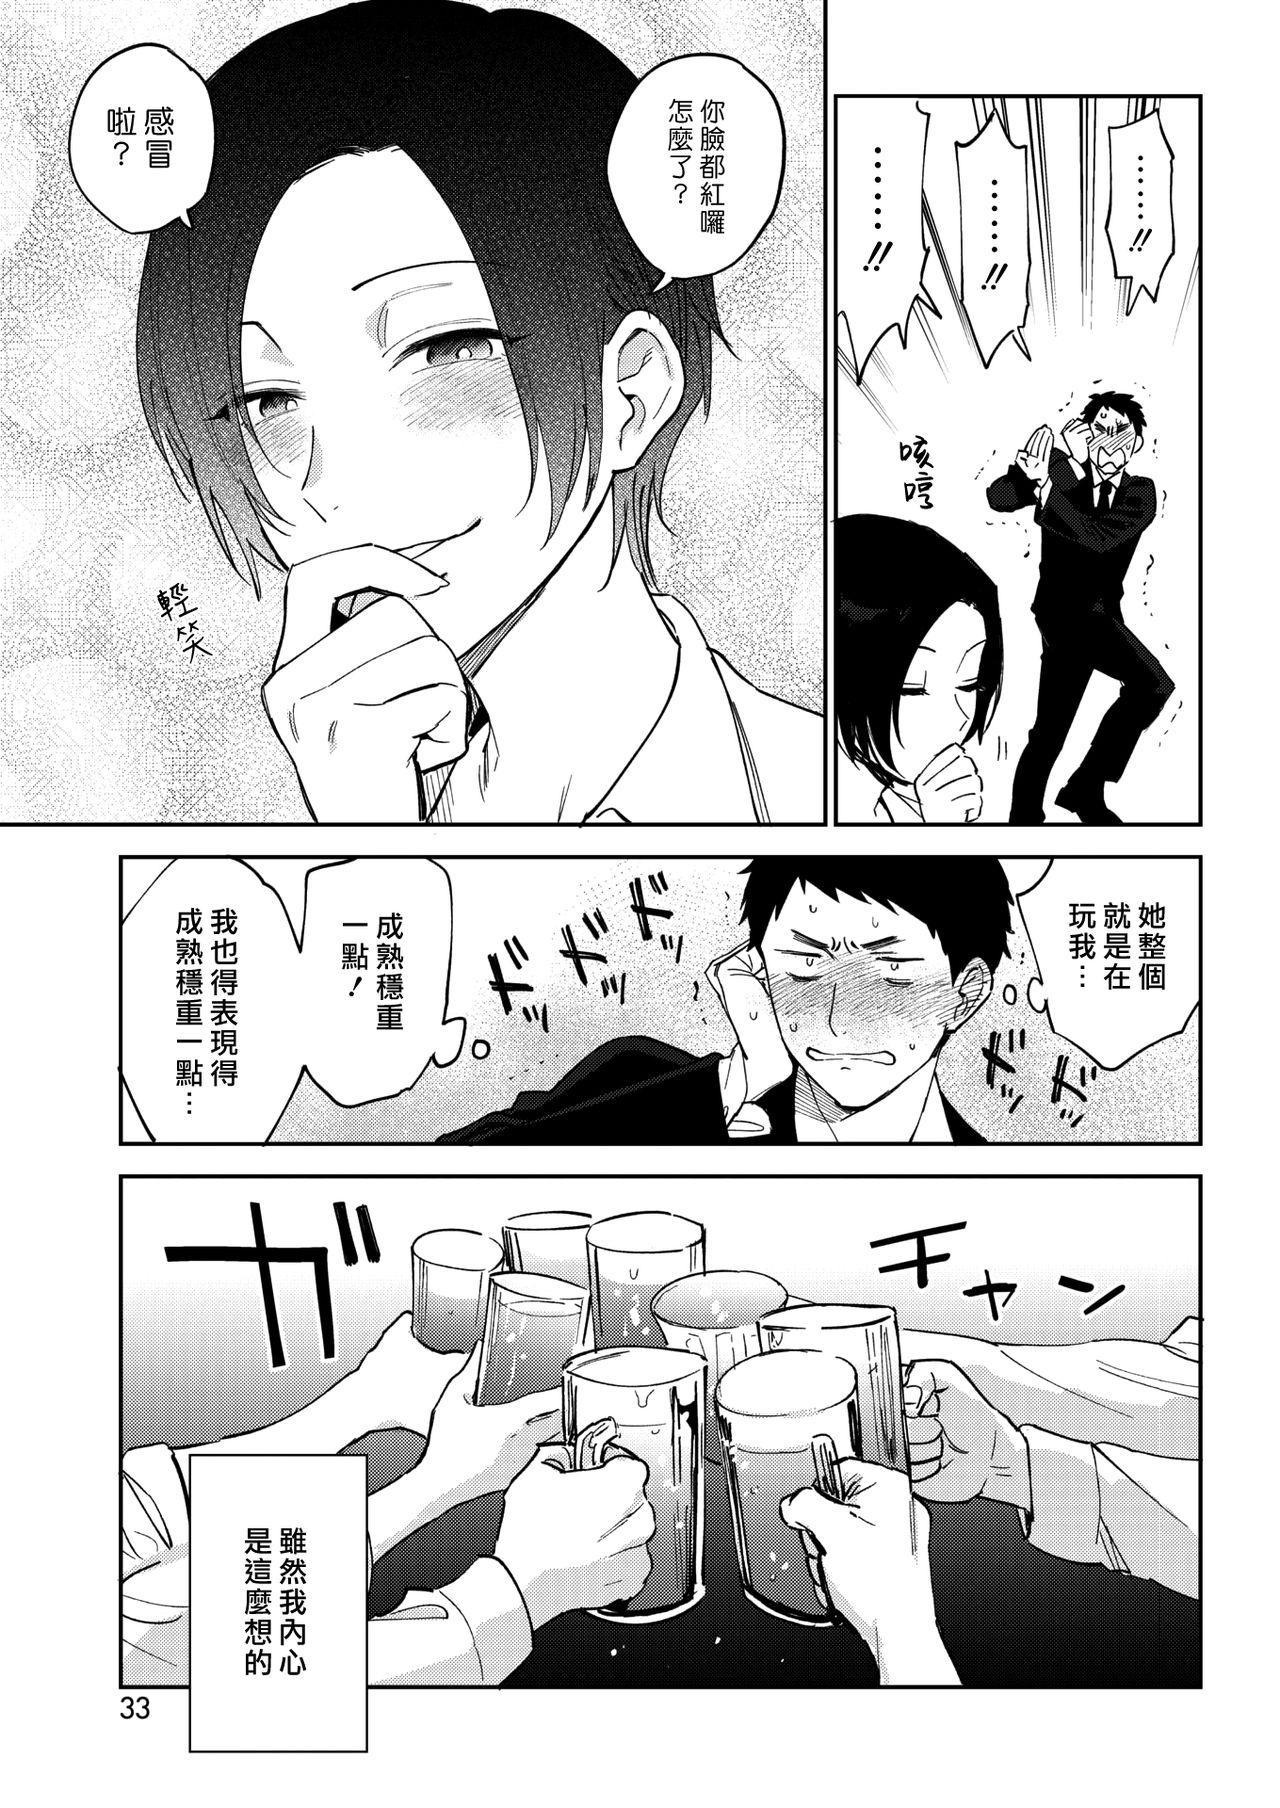 Muramata-san no Himitsu 2 | 村又小姐的秘密 2 2